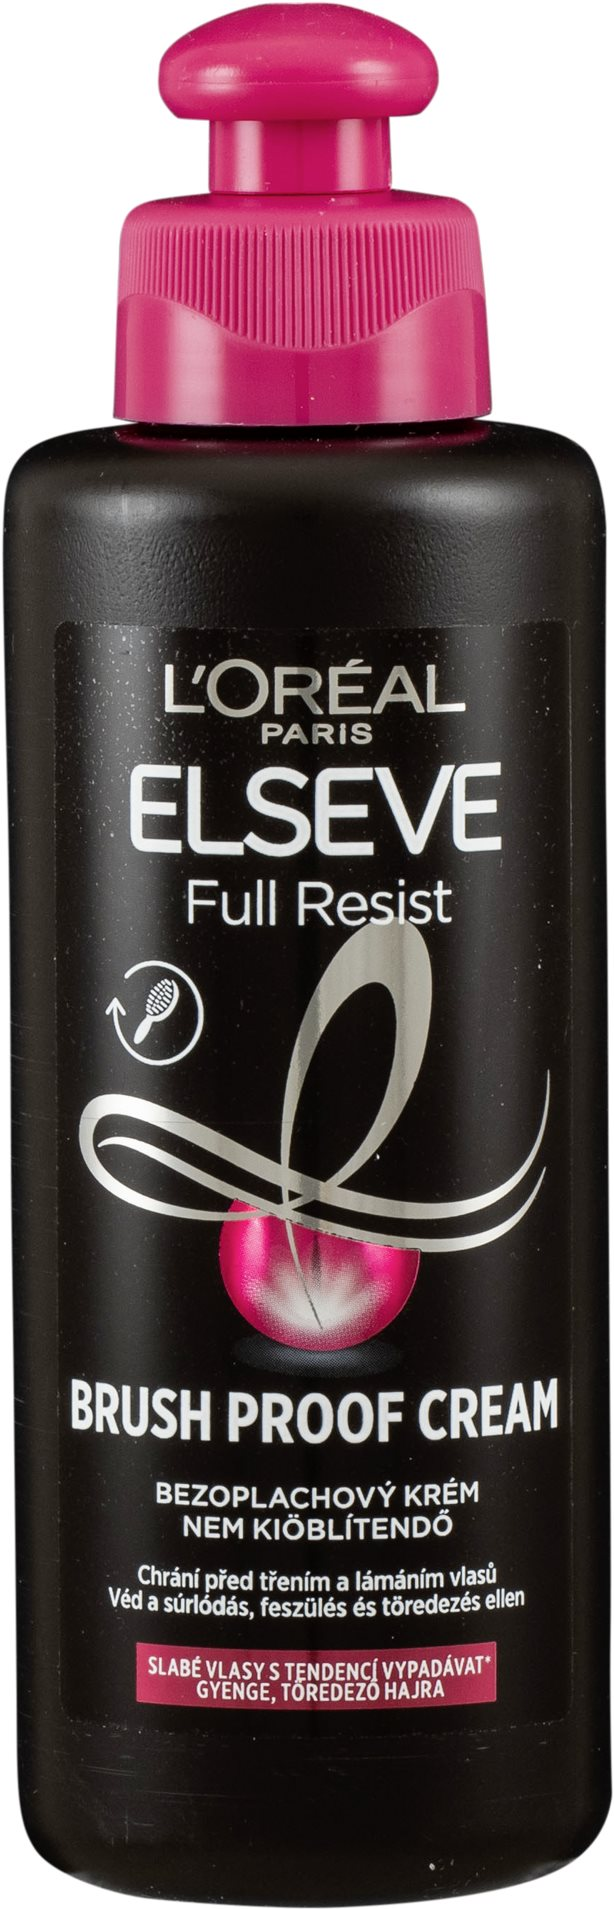 ĽORÉAL PARIS Elseve Full Resist Brush Proof Cream 200 ml